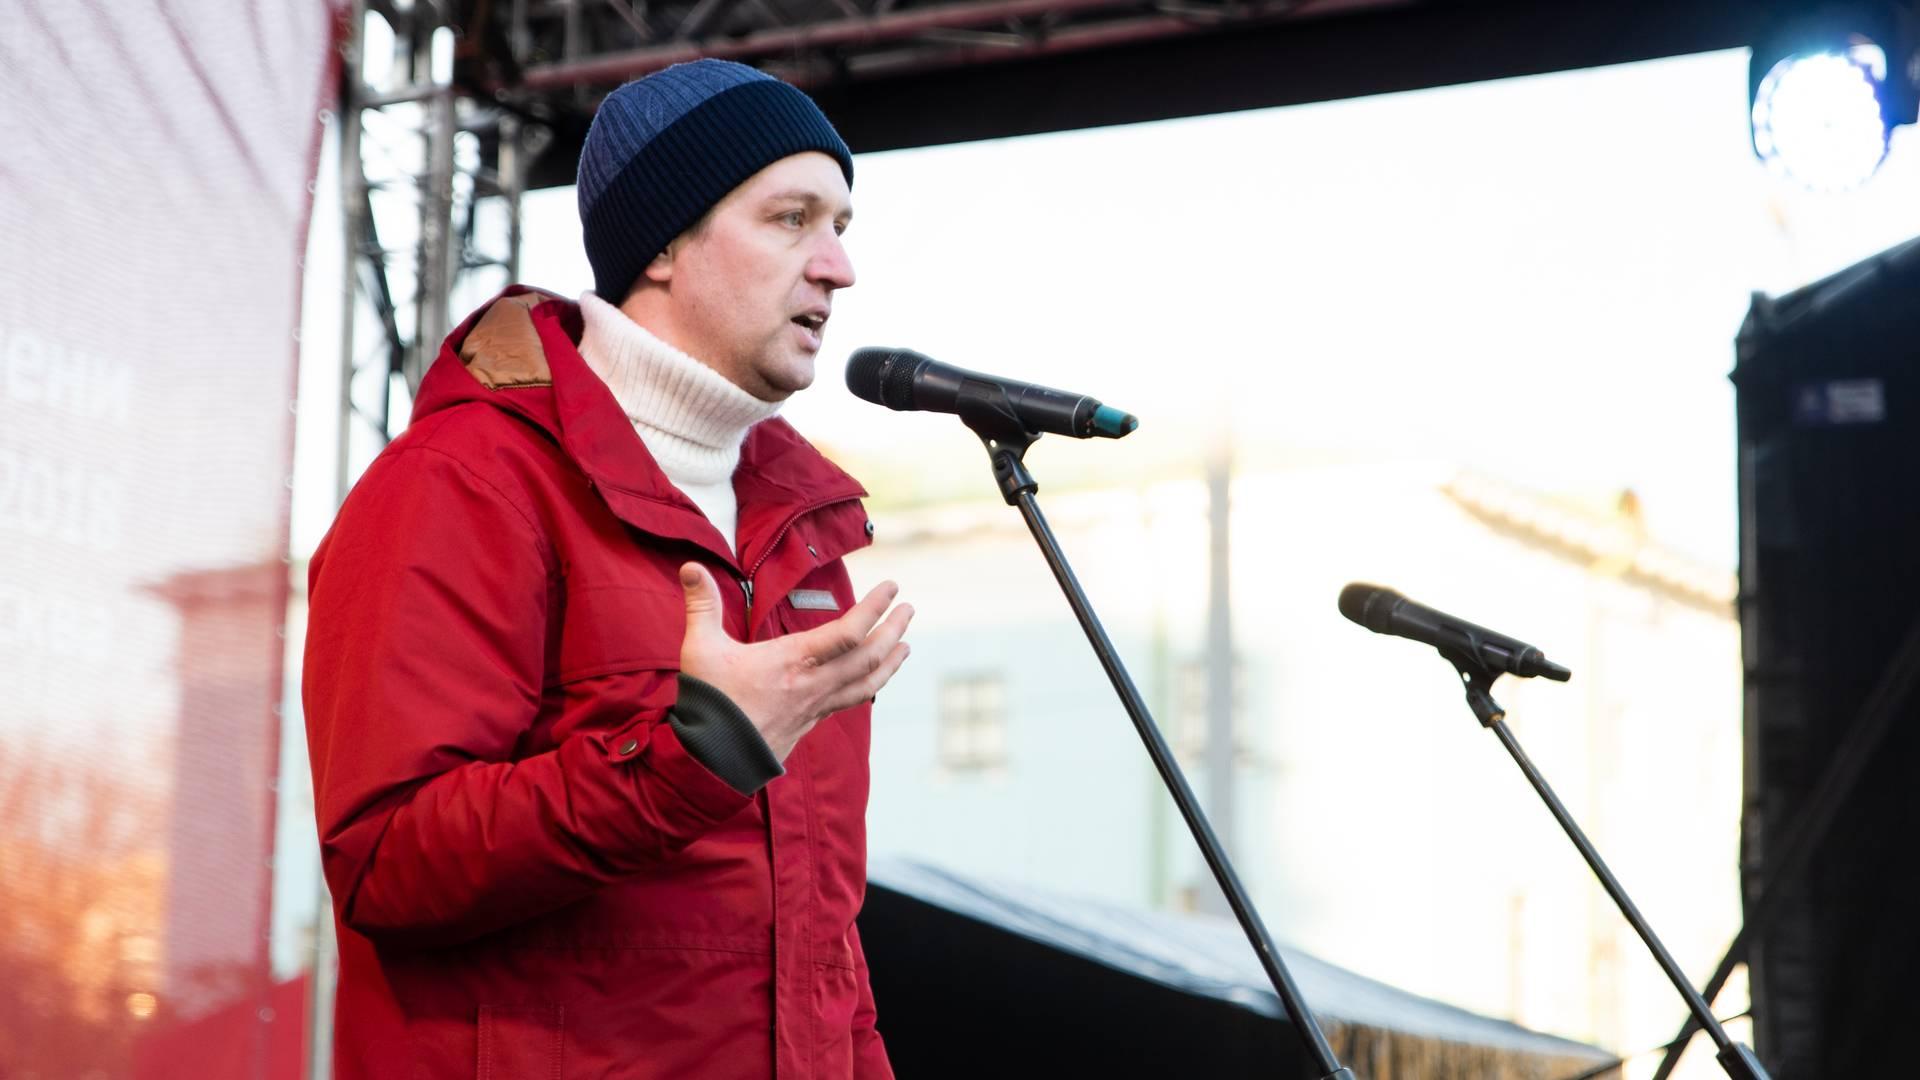 Алексей Кулаев на митинге «Сути времени»в Москве, 5 ноября 2018 г.